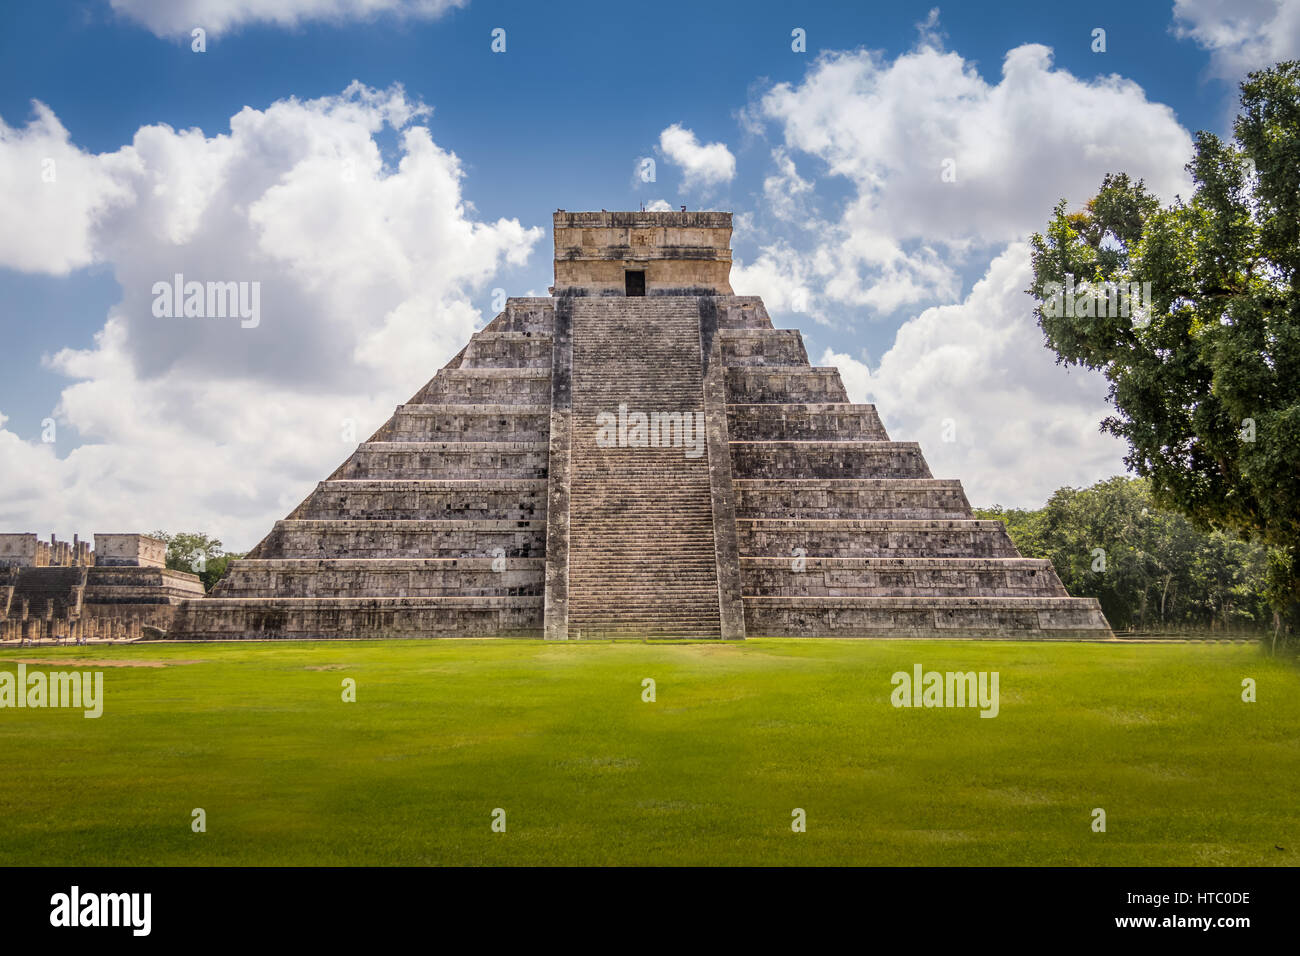 Tempio maya Piramide di Kukulkan - Chichen Itza, Yucatan, Messico Immagini Stock